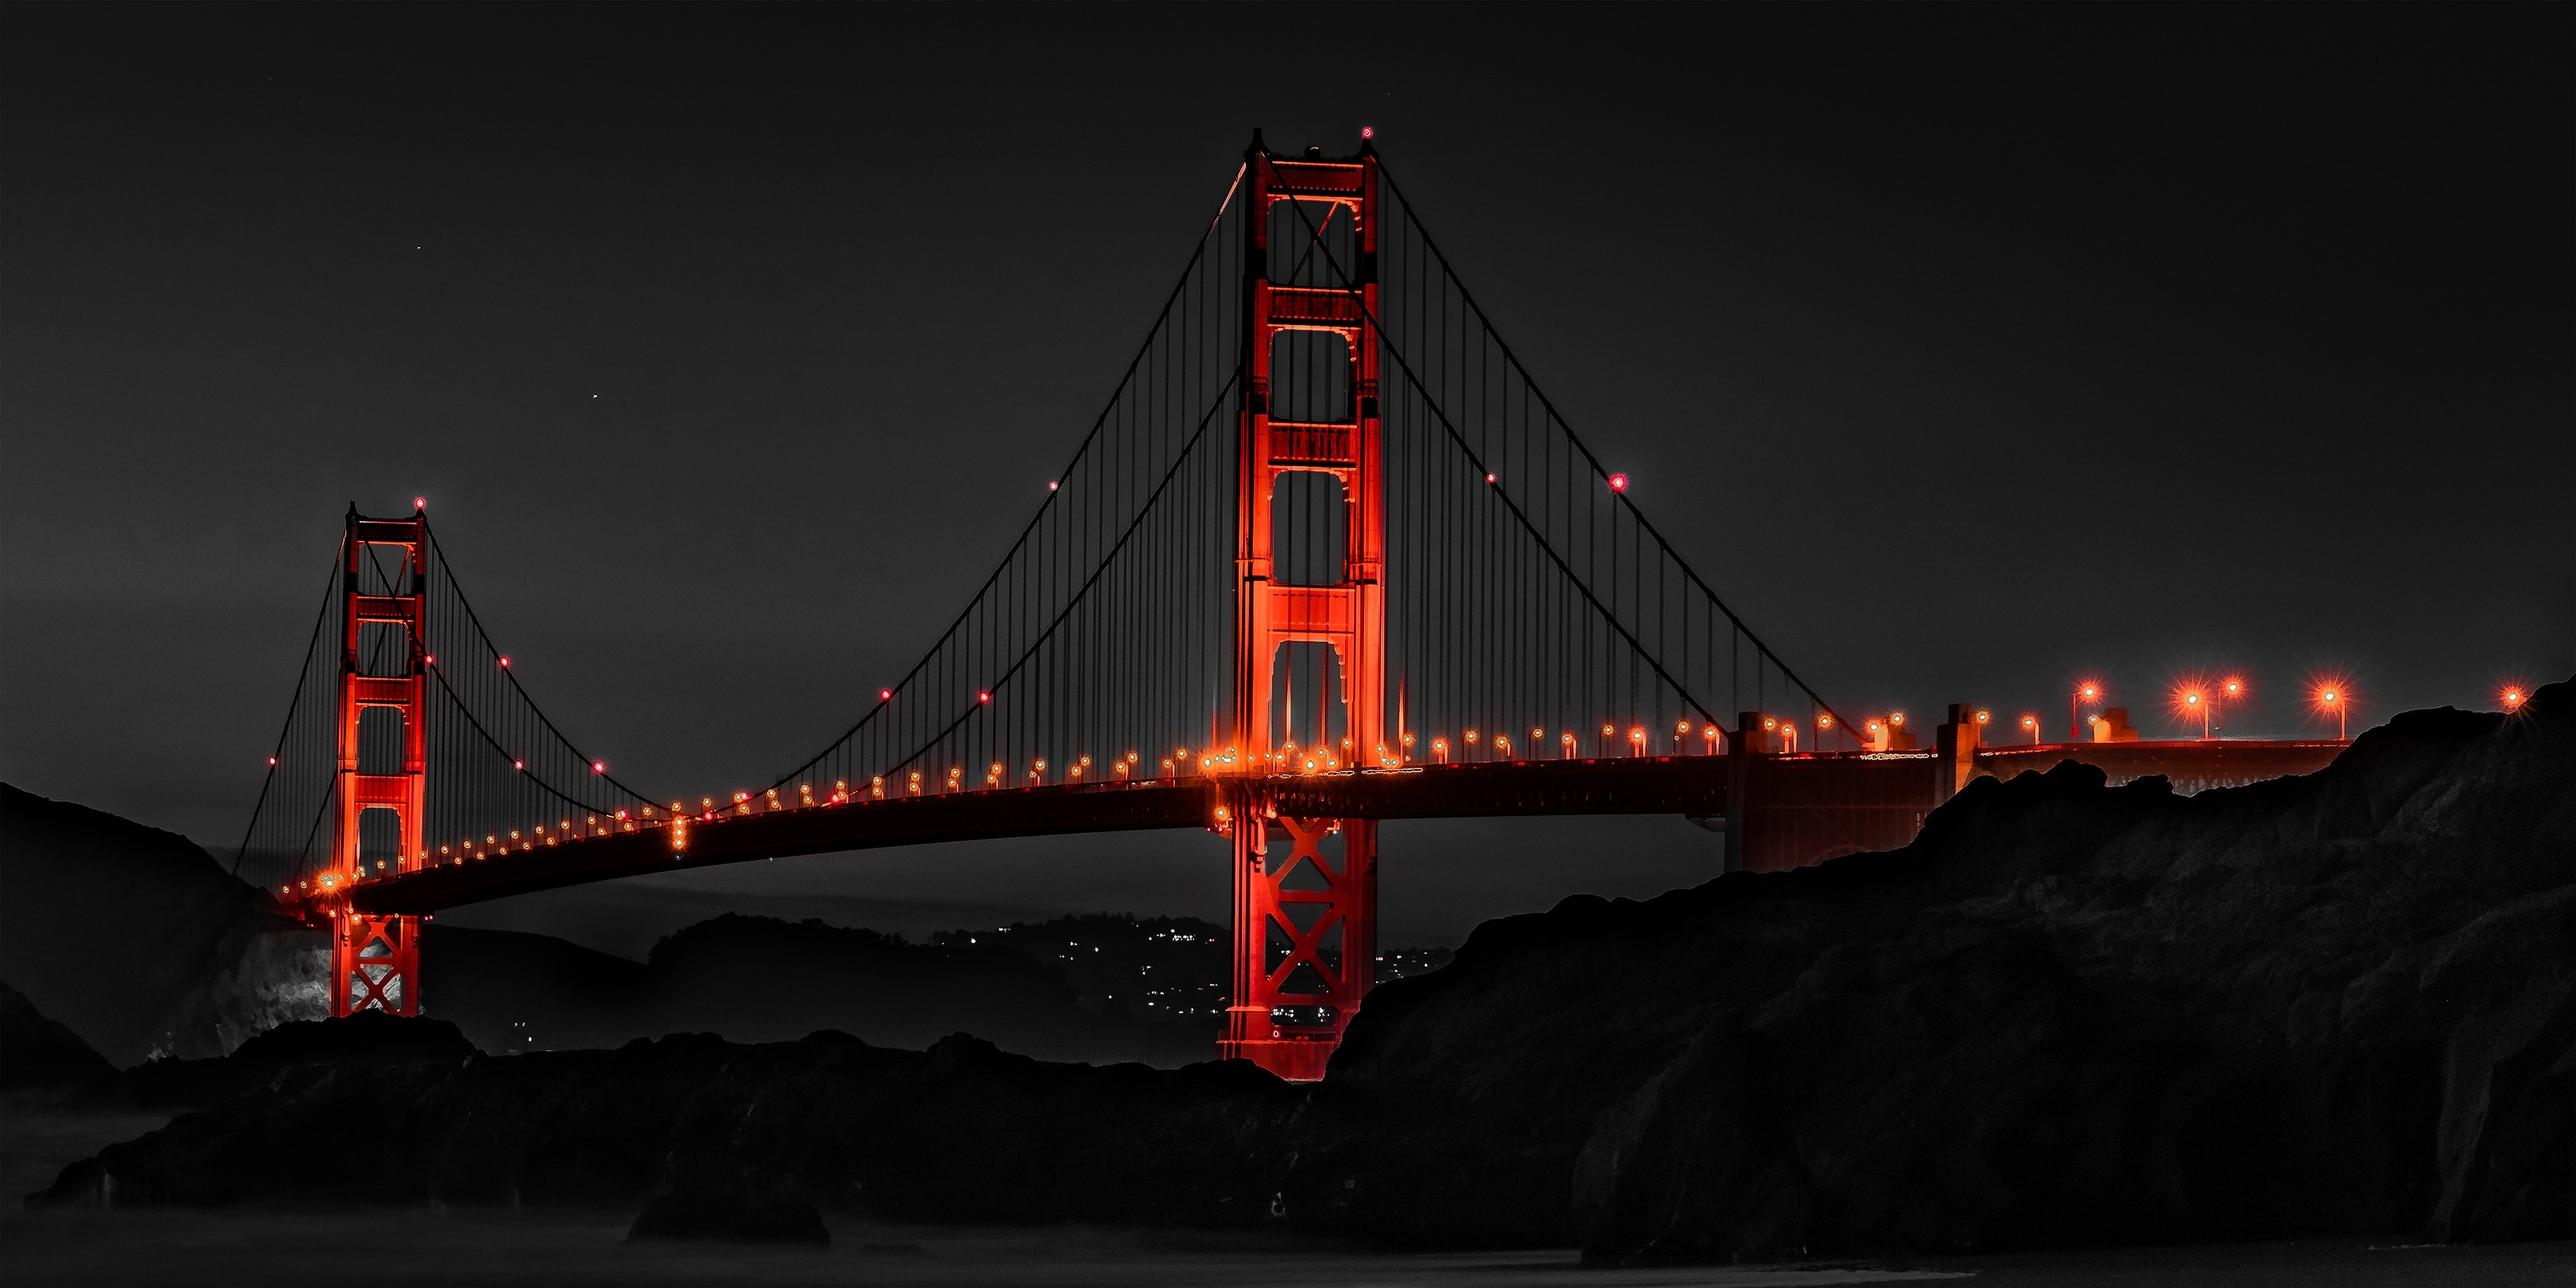 Must see Wallpaper Night Landscape - pexels-photo-417054  You Should Have-84699.jpeg?auto\u003dcompress\u0026cs\u003dtinysrgb\u0026h\u003d350